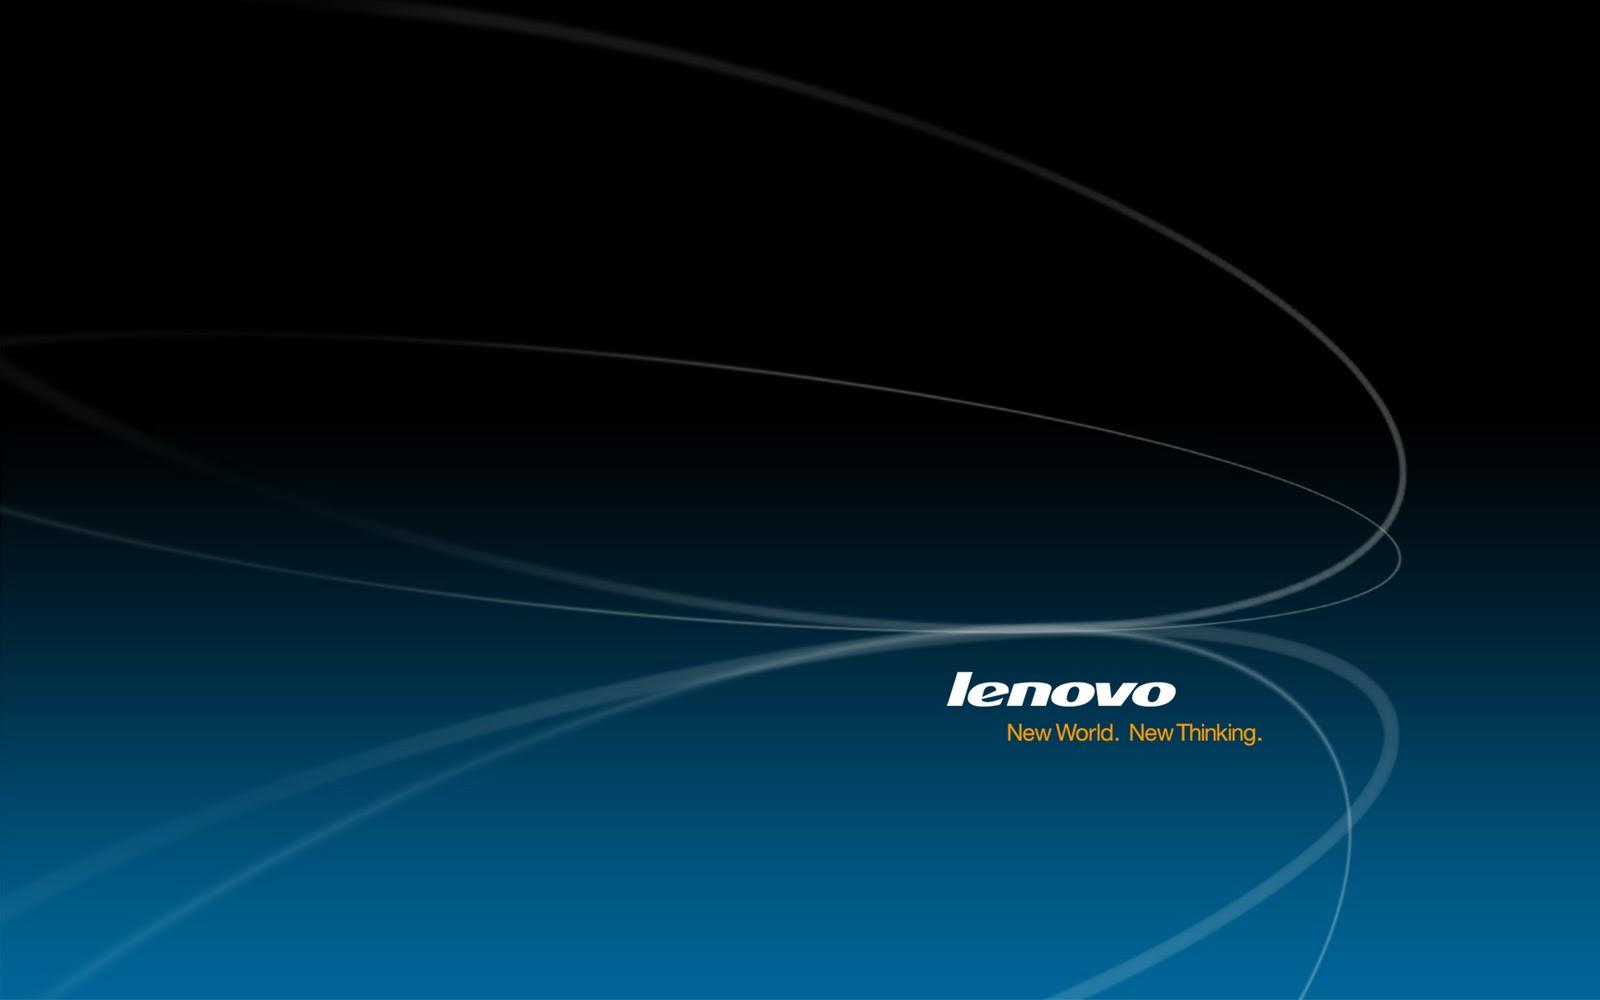 My Today in My Beautiful Life IBM lenovo Thinkpad HD Wallpapers 1600x1000